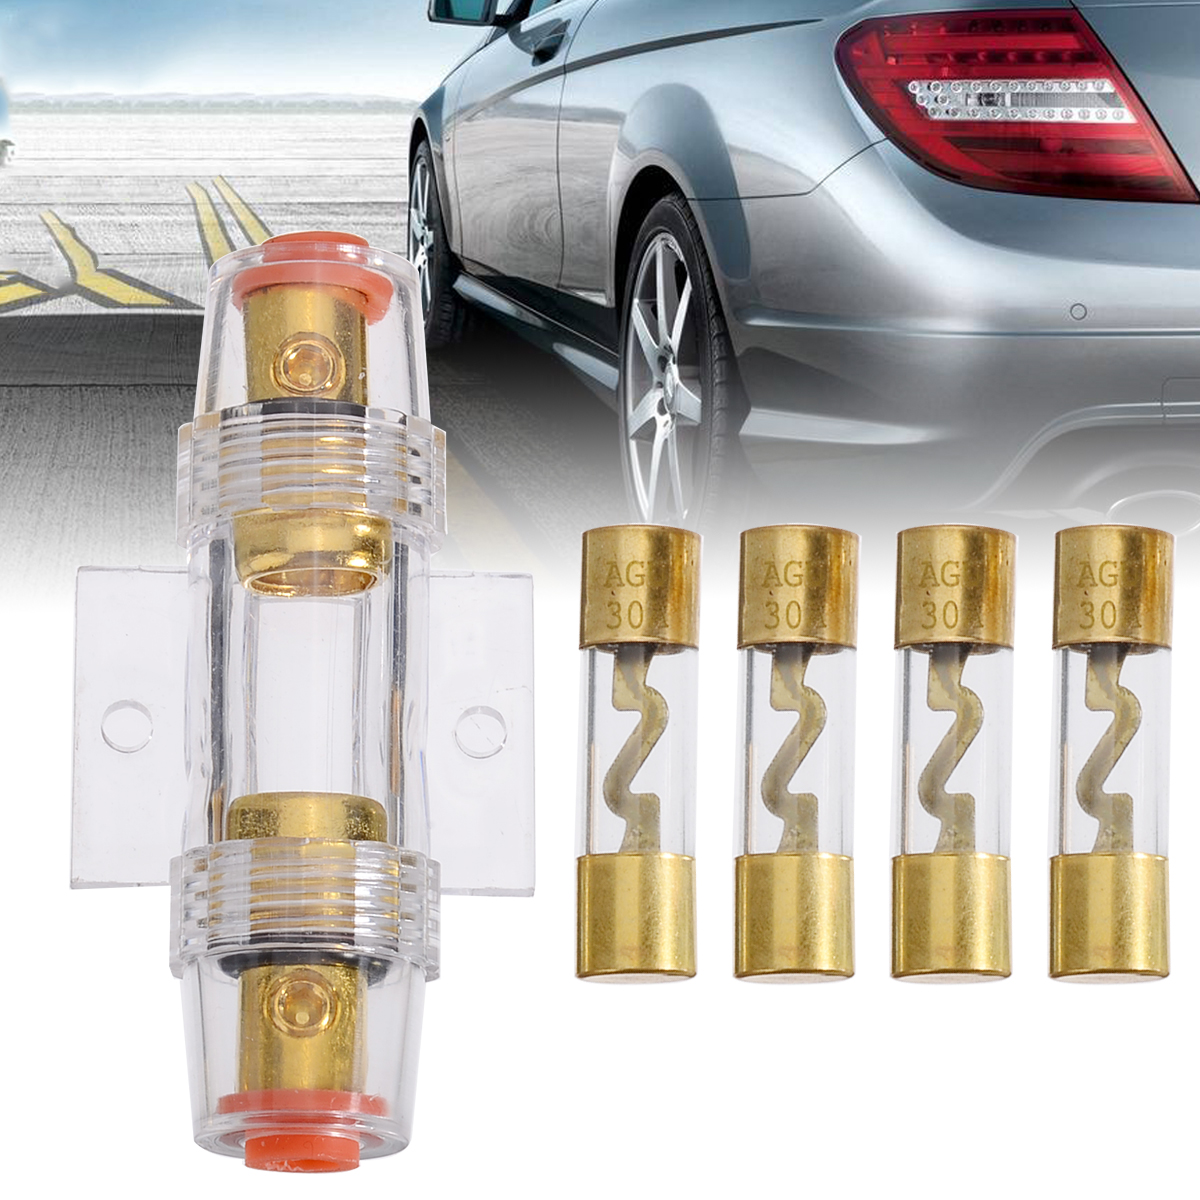 New Arrival 1pcs 30A Car Audio AGU Fuse Holder with 4 30A Fuses For Car Audio Refit Fuse Holder Car Stereo Audio Circuit